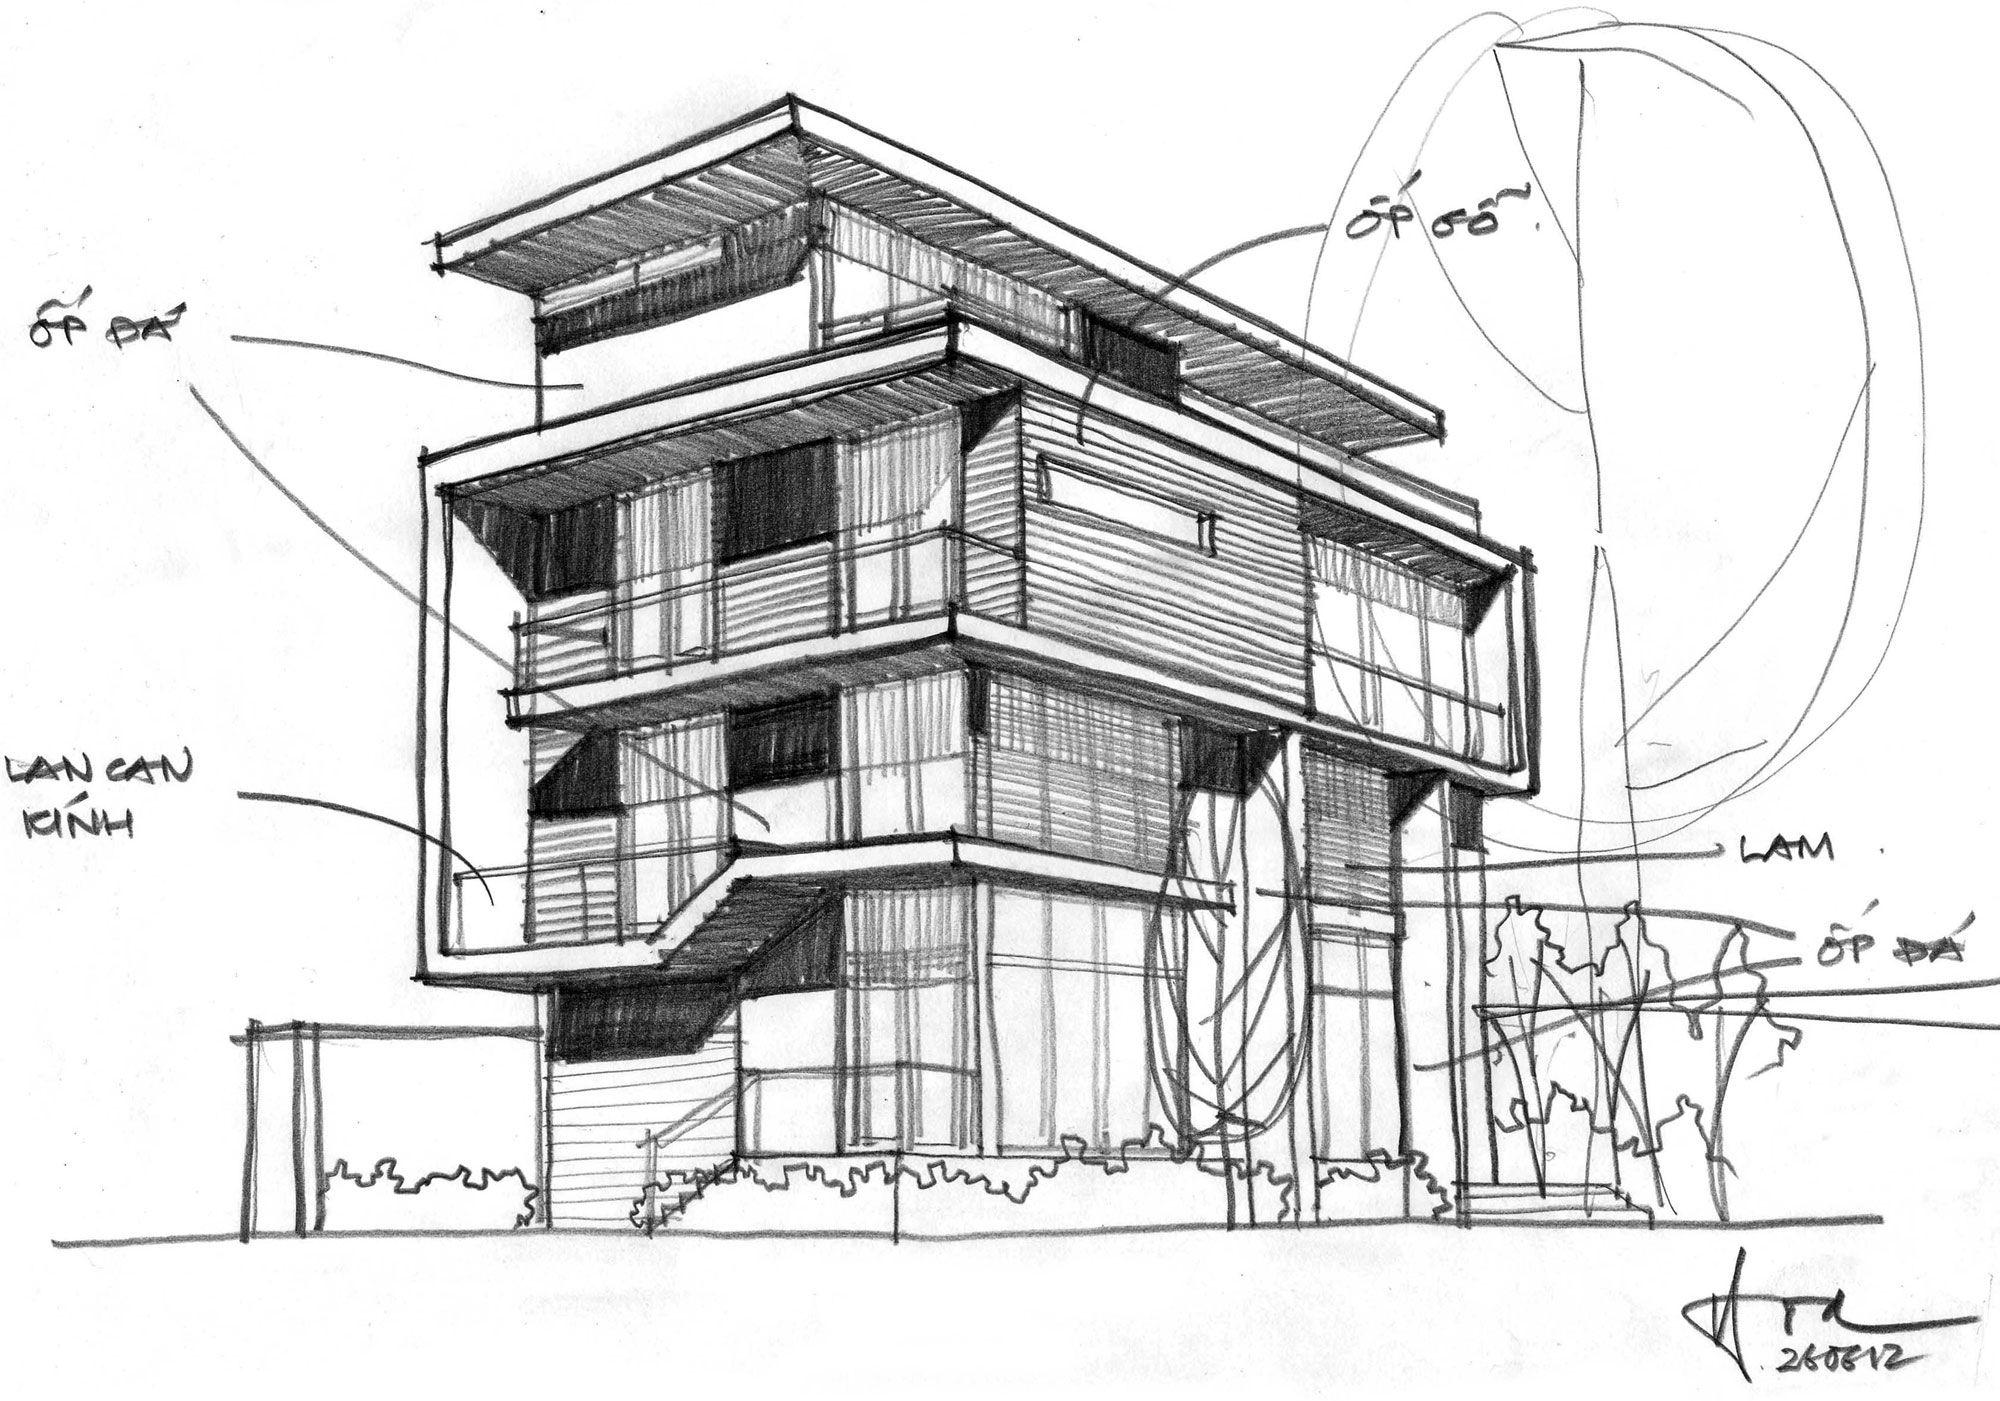 F2 Villa By Dang Duc Hoa Block Architects 22